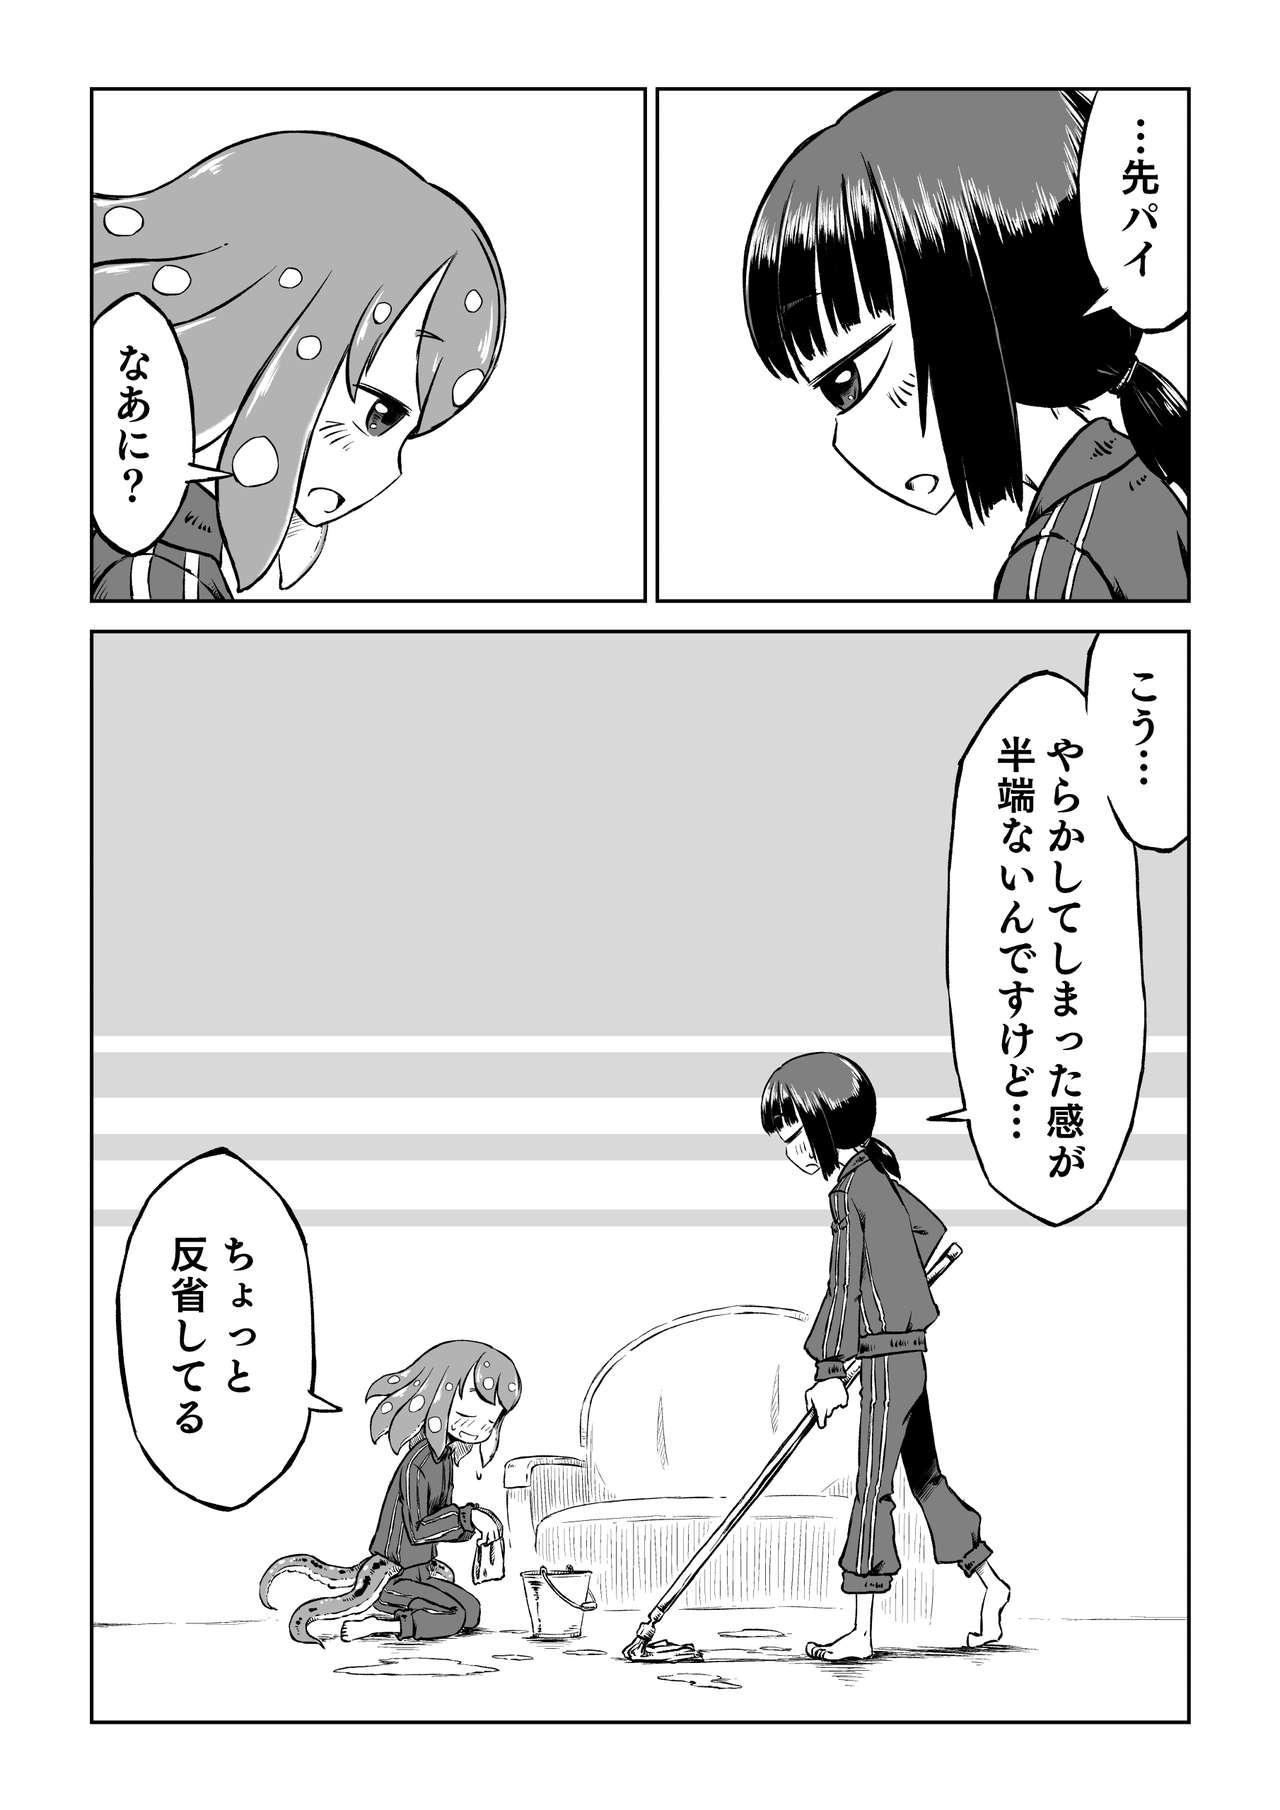 Tako Musume to Tangan Musume ga XX Suru Dake. 17